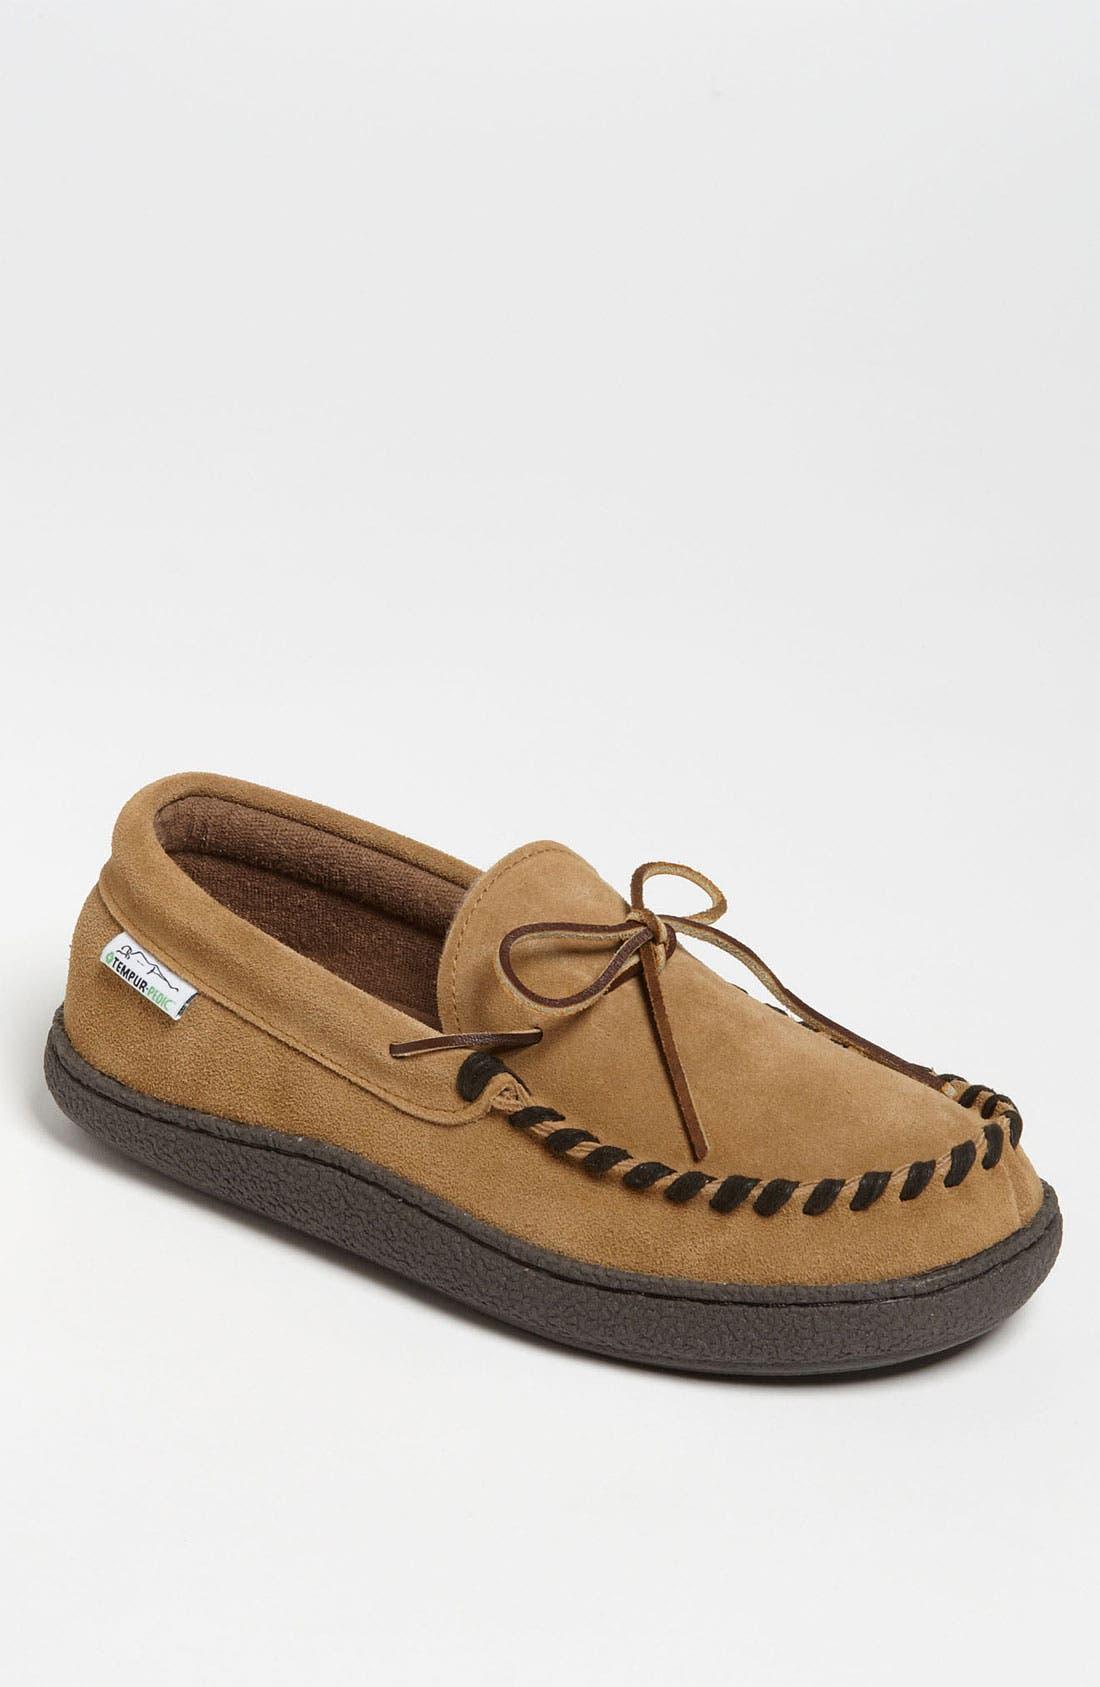 Main Image - Tempur-Pedic® Suede Moccasin Slipper